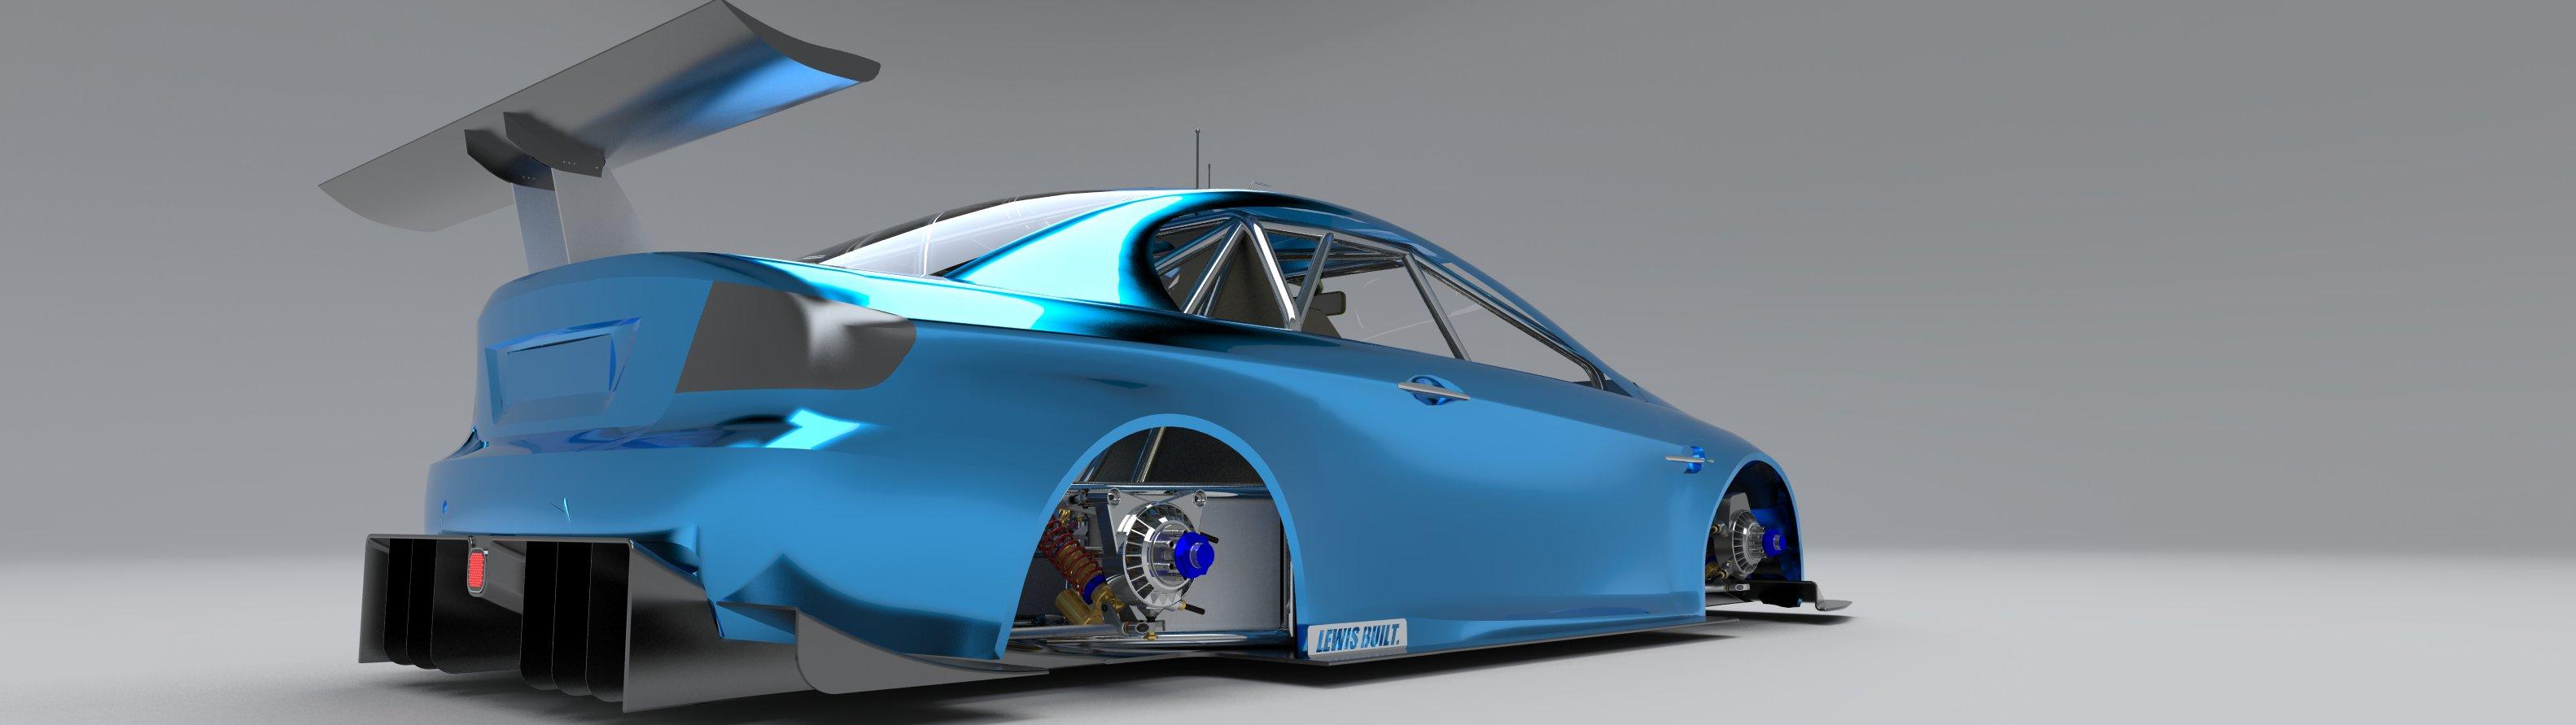 PEASNELL RACING DESIGN _ CONCEPT SKETCH _BMW_RACECAR (3)